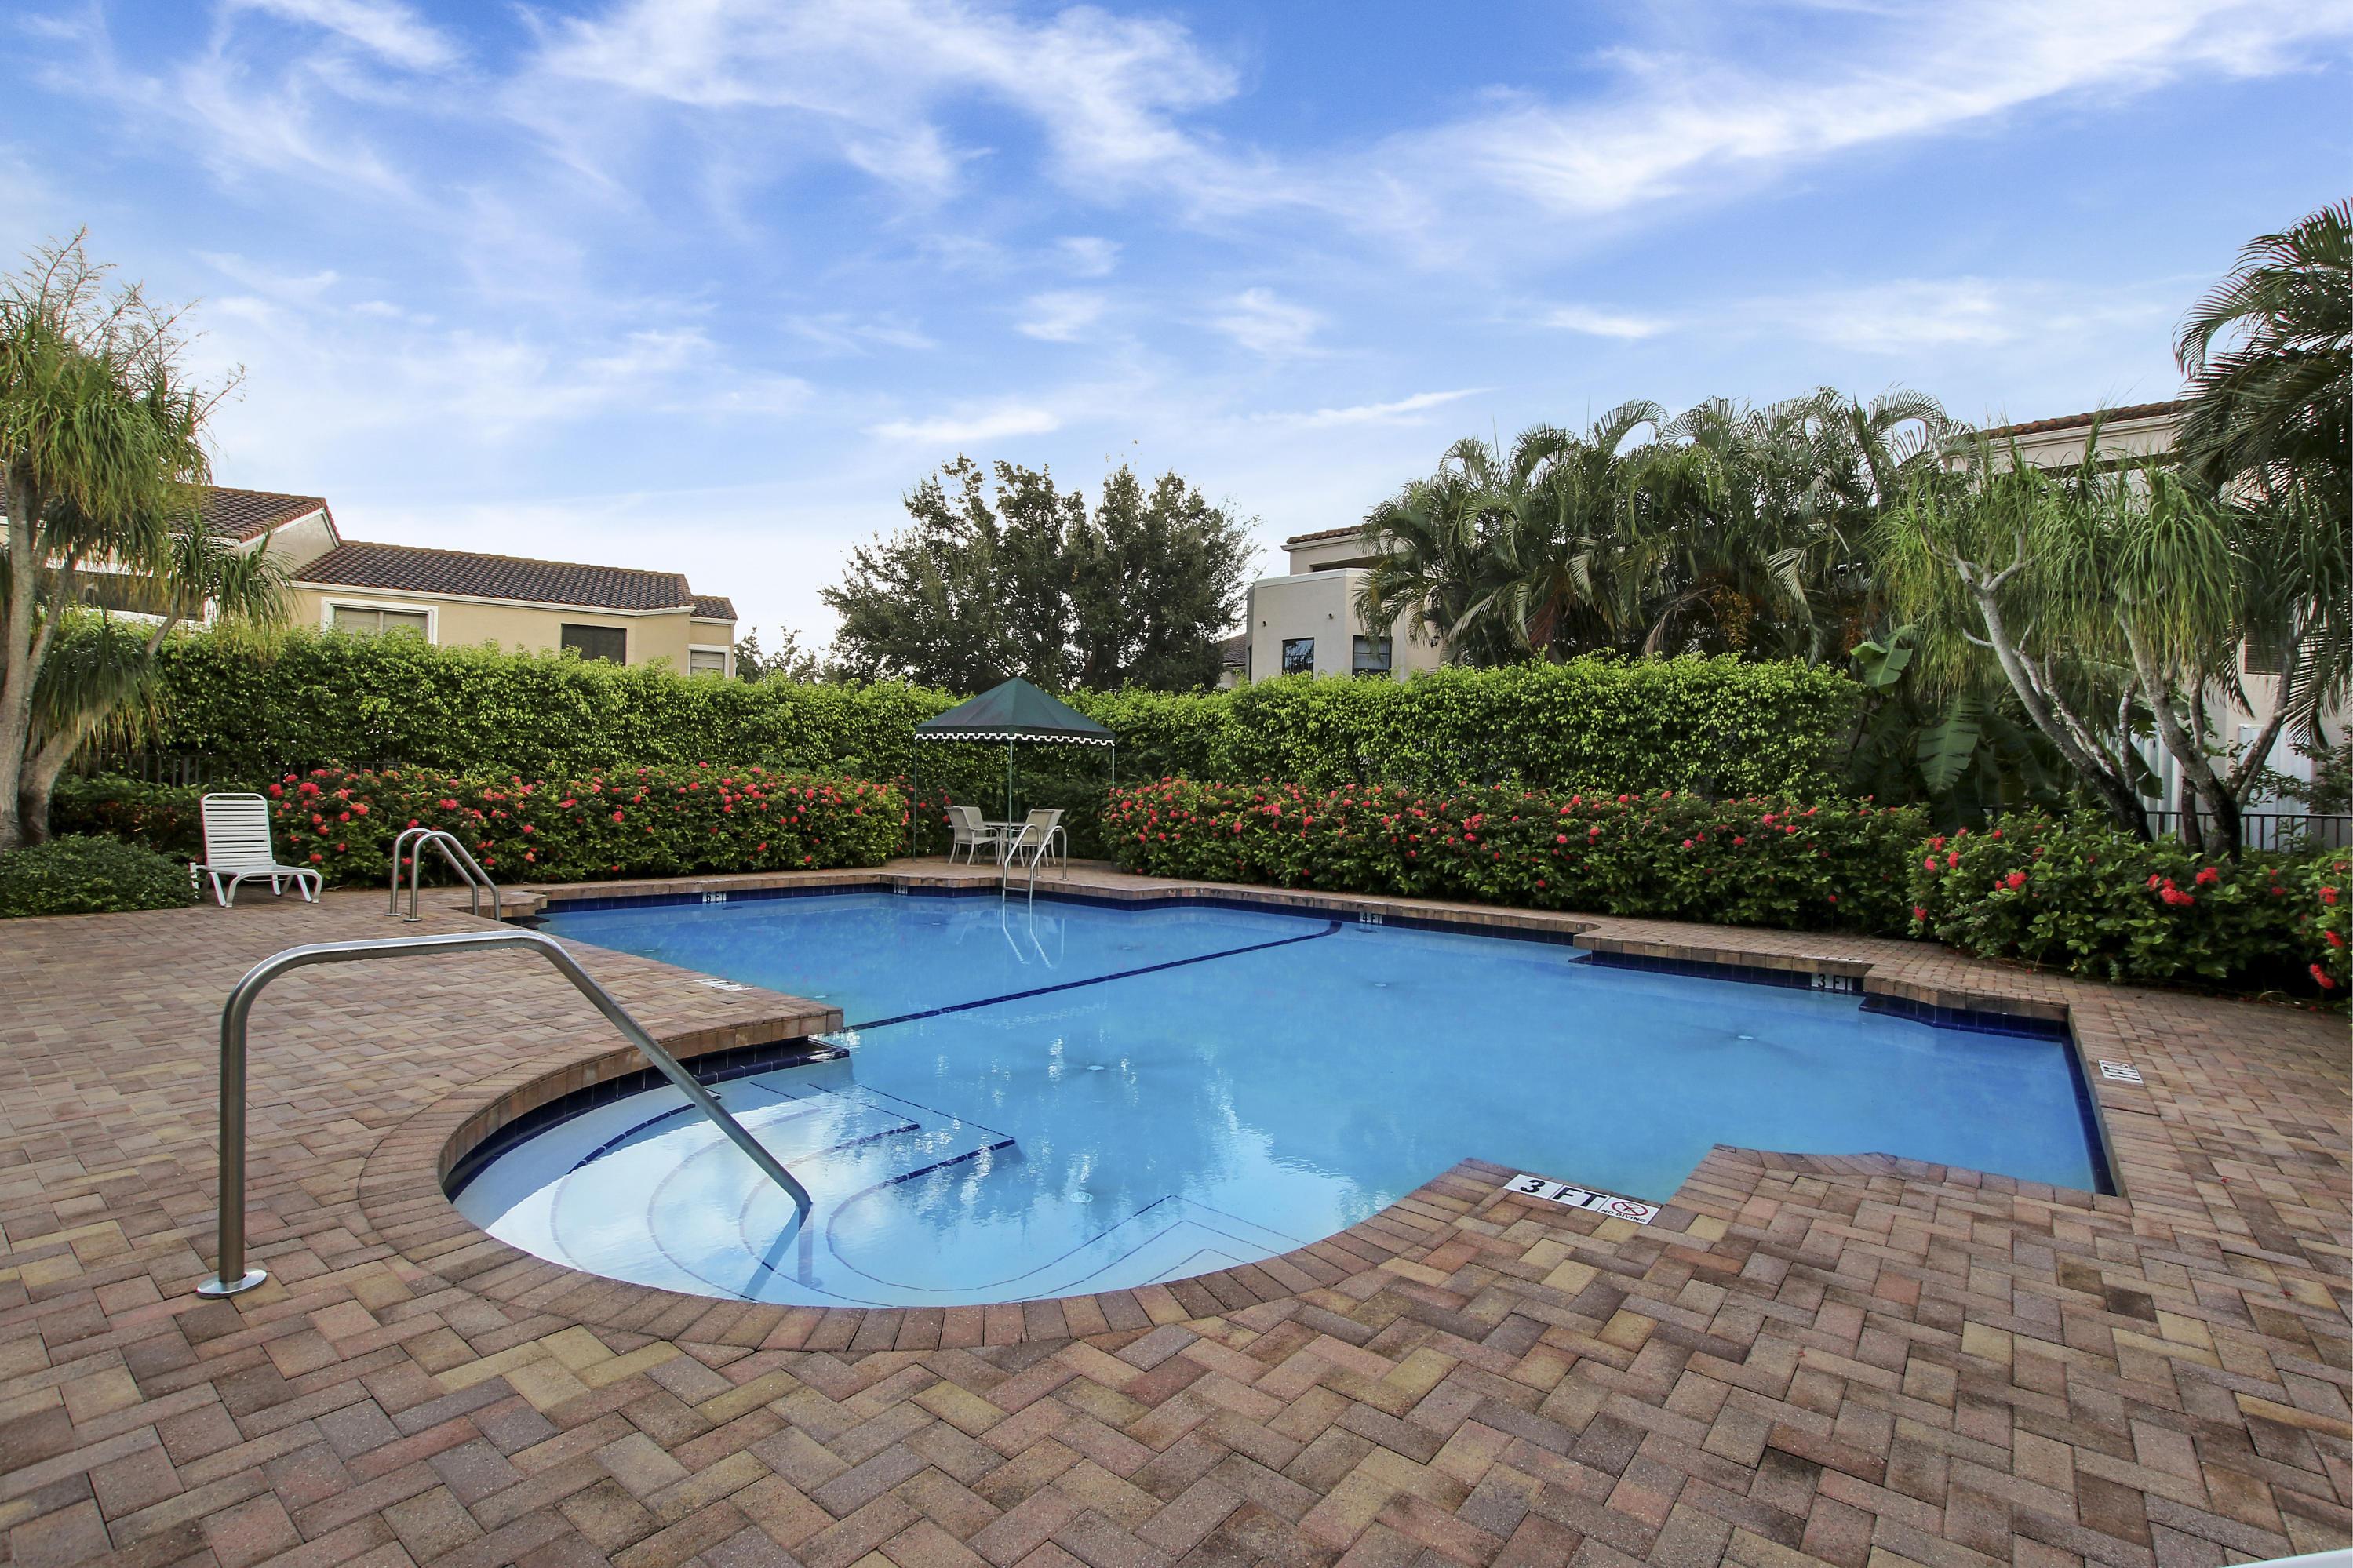 6630 Villa Sonrisa Drive 720 Boca Raton, FL 33433 photo 15